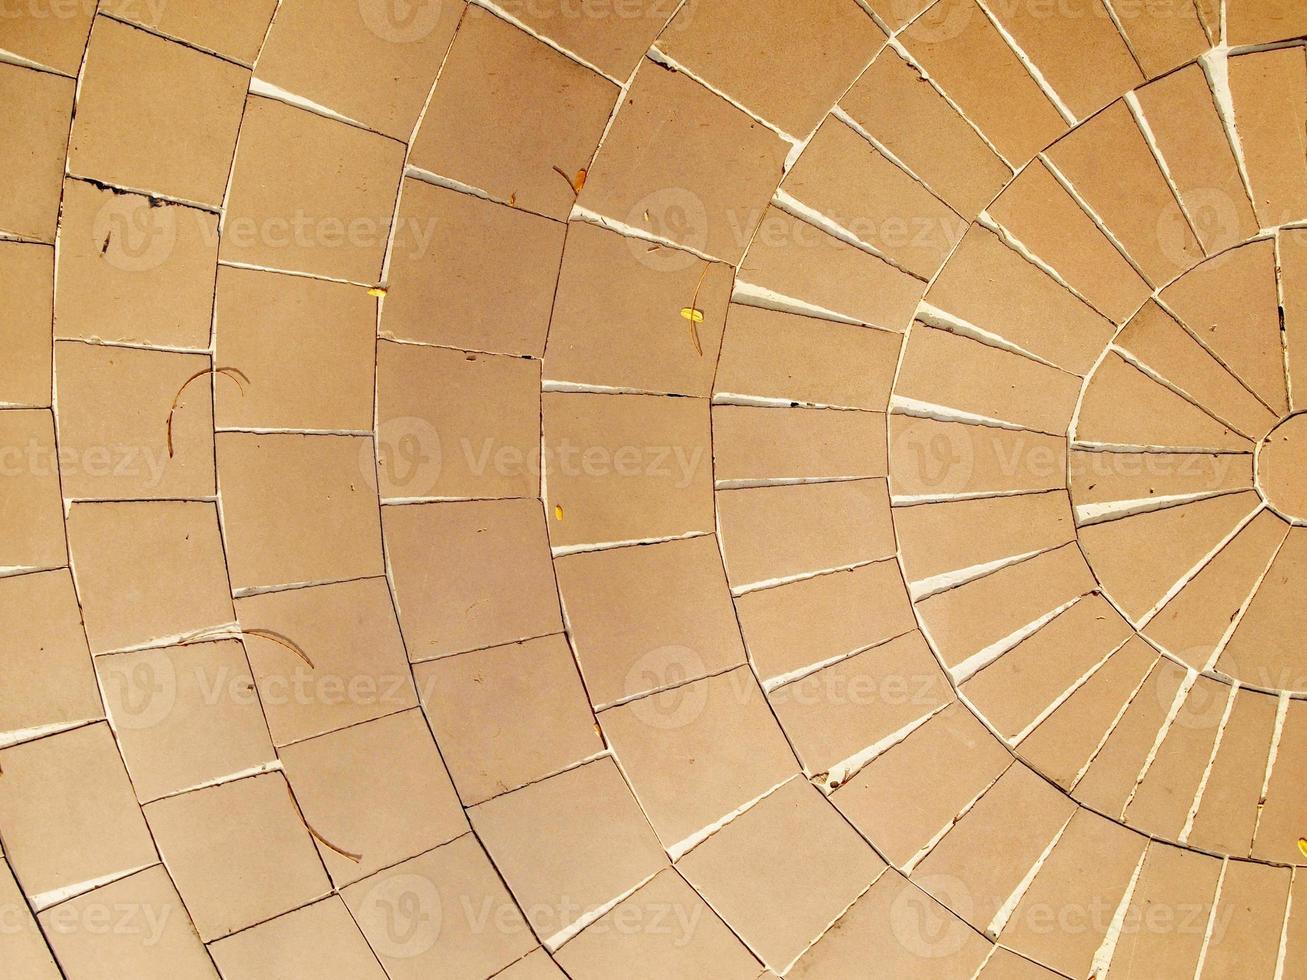 paredes de tijolo de close-up foto